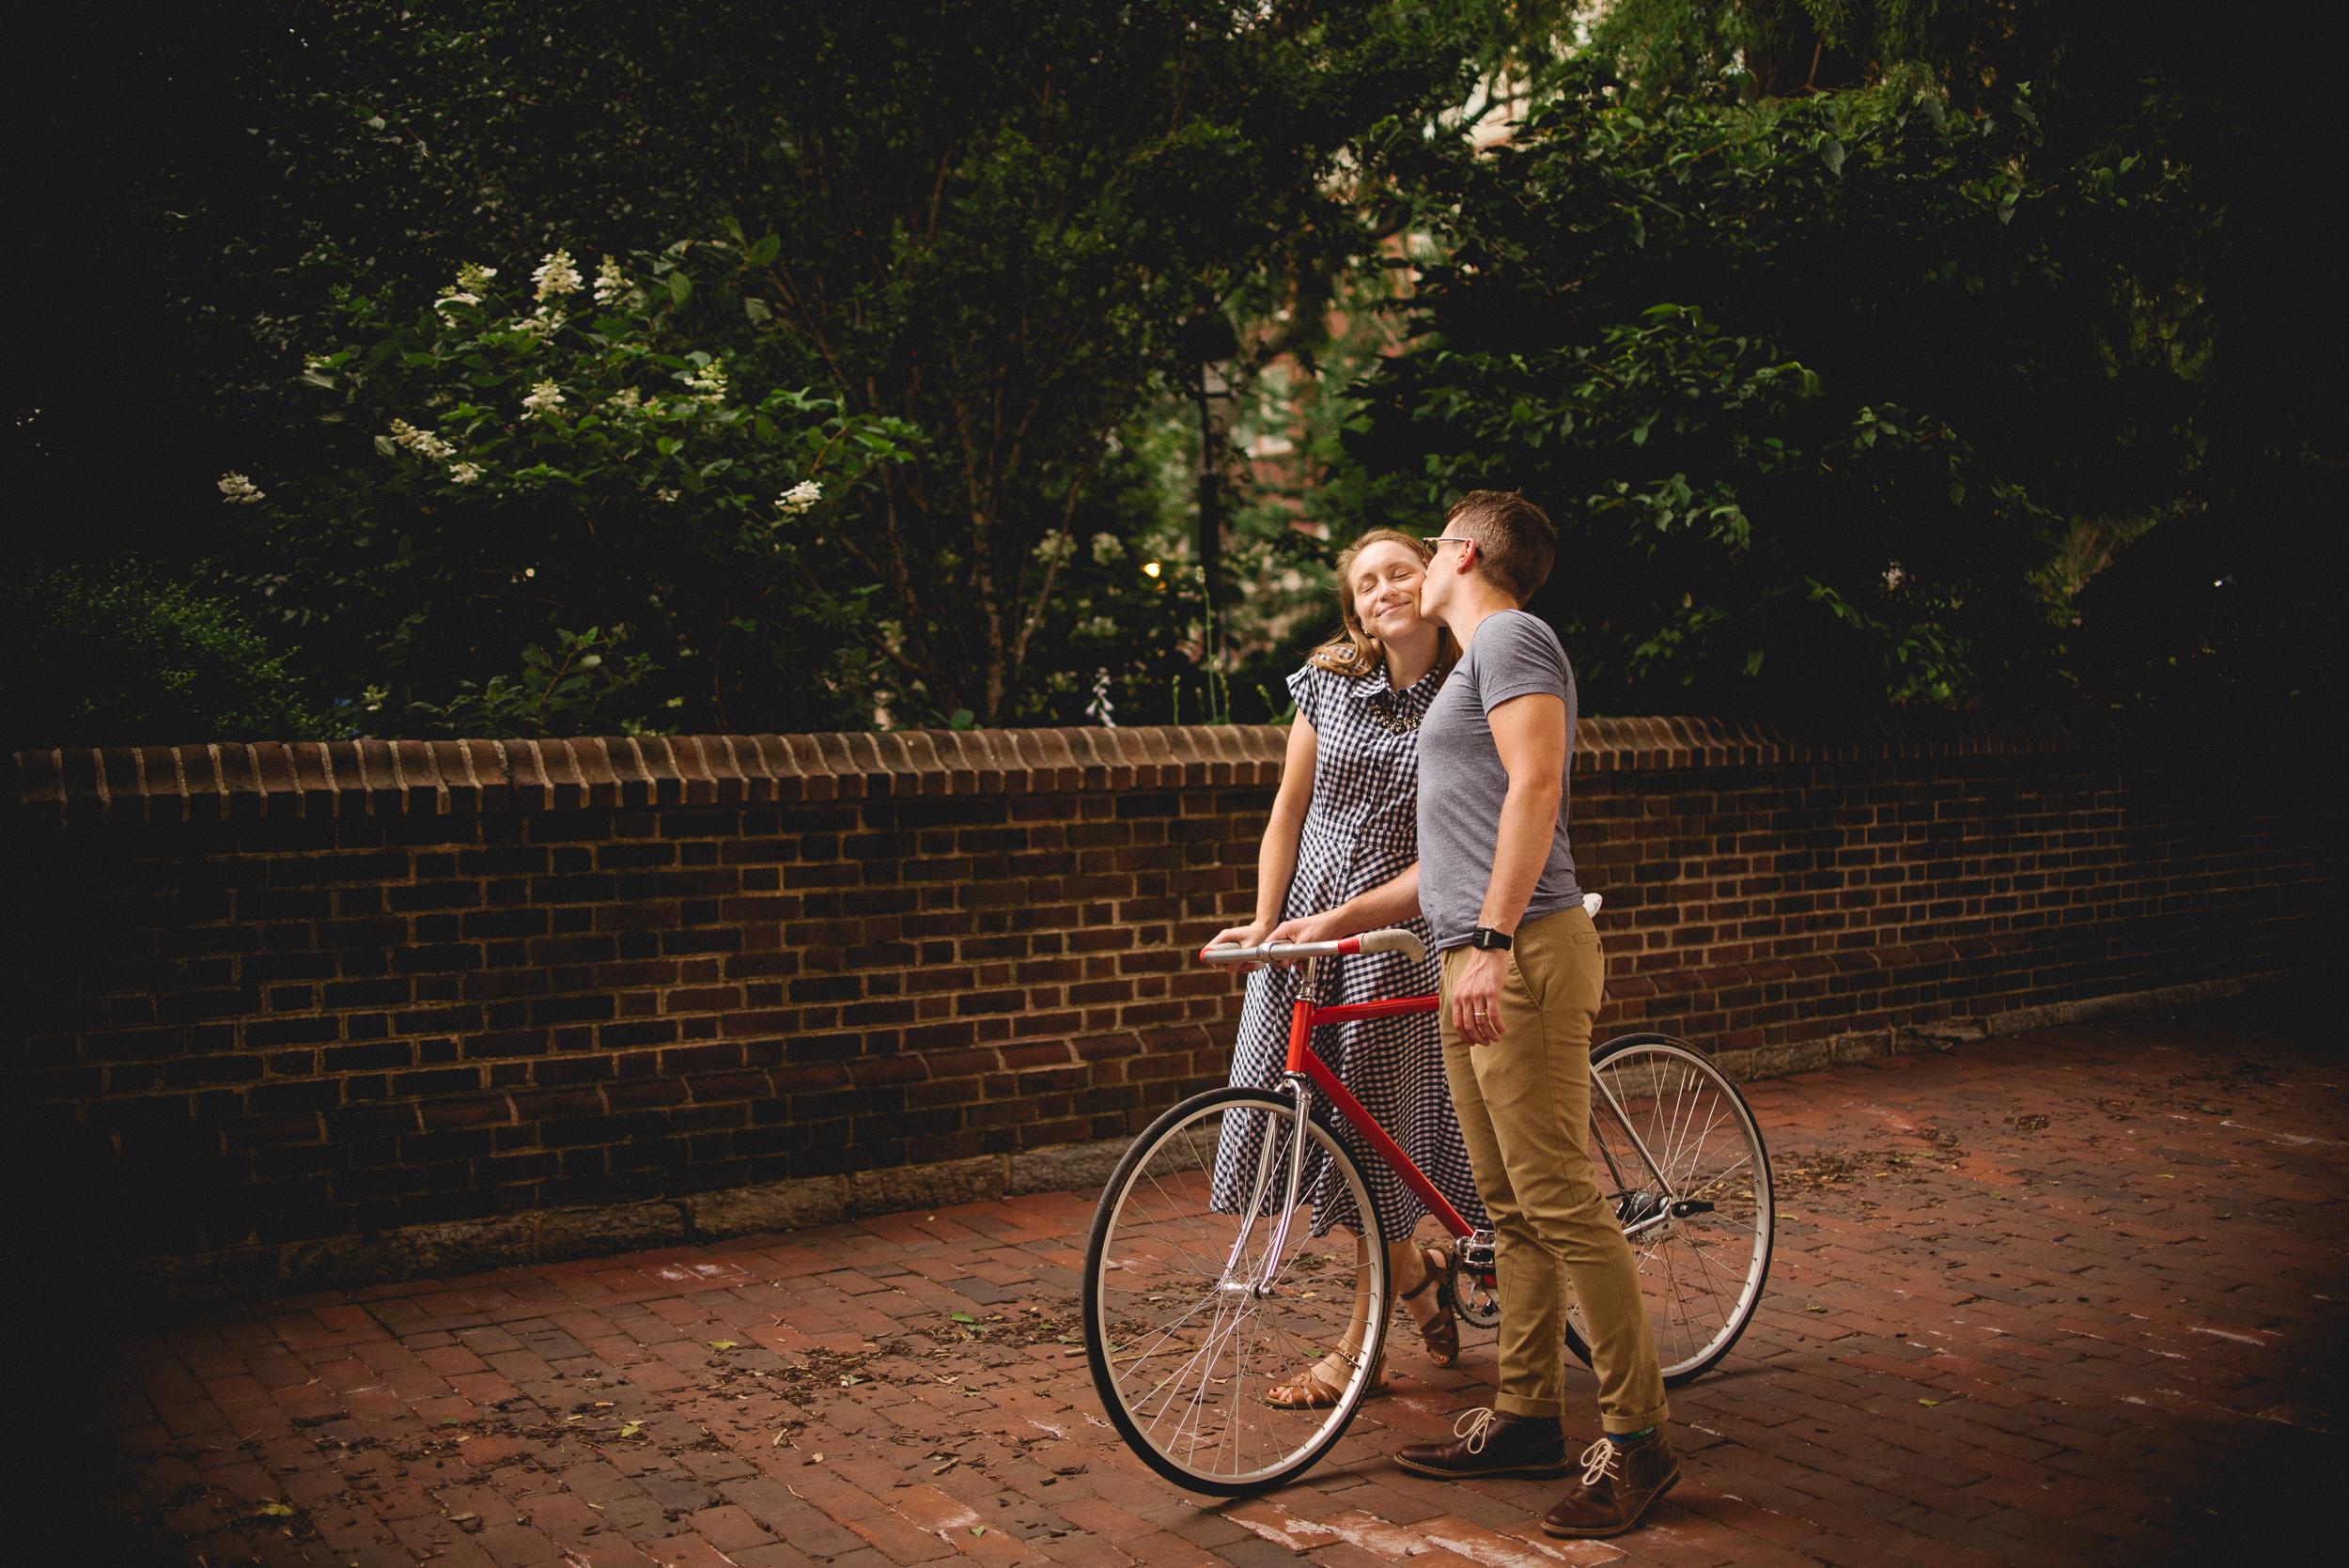 Peaberry-Photography-Society-Hill-Philadelphia-Pennsylvania-Newlyweds-Just-Married-041.jpg